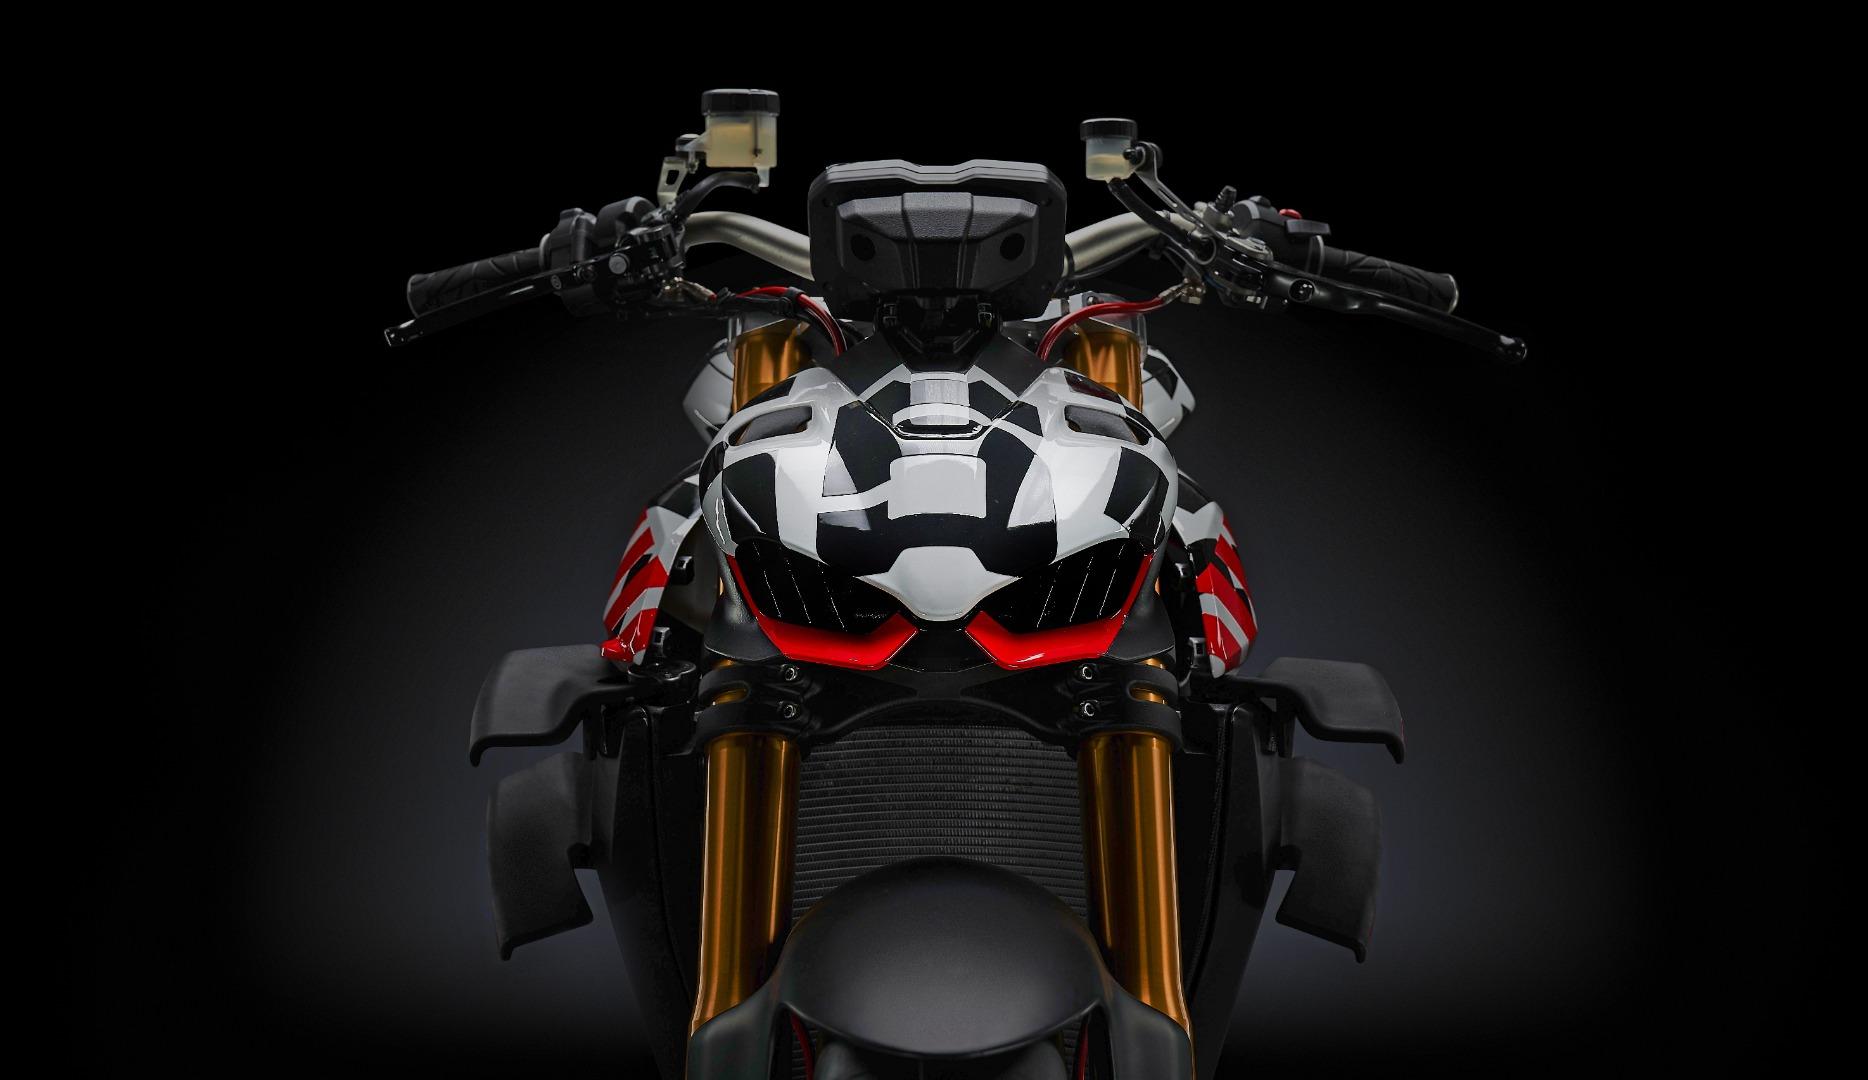 Ducati Streetfighter V4, agárrate porque llegan curvas